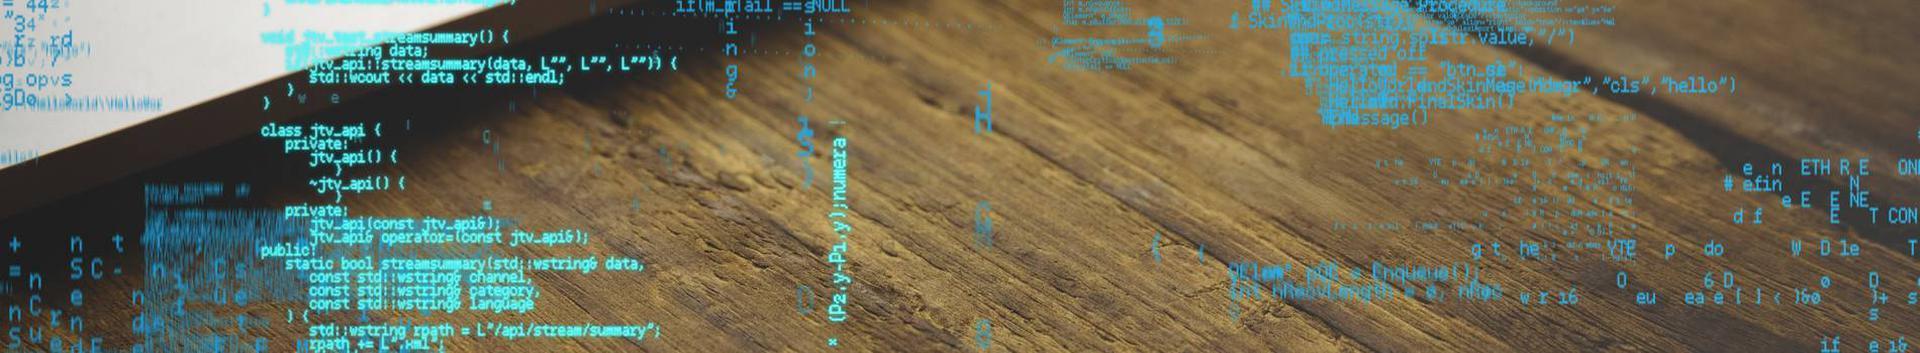 62011_programmeerimine_65876430_xl.jpg